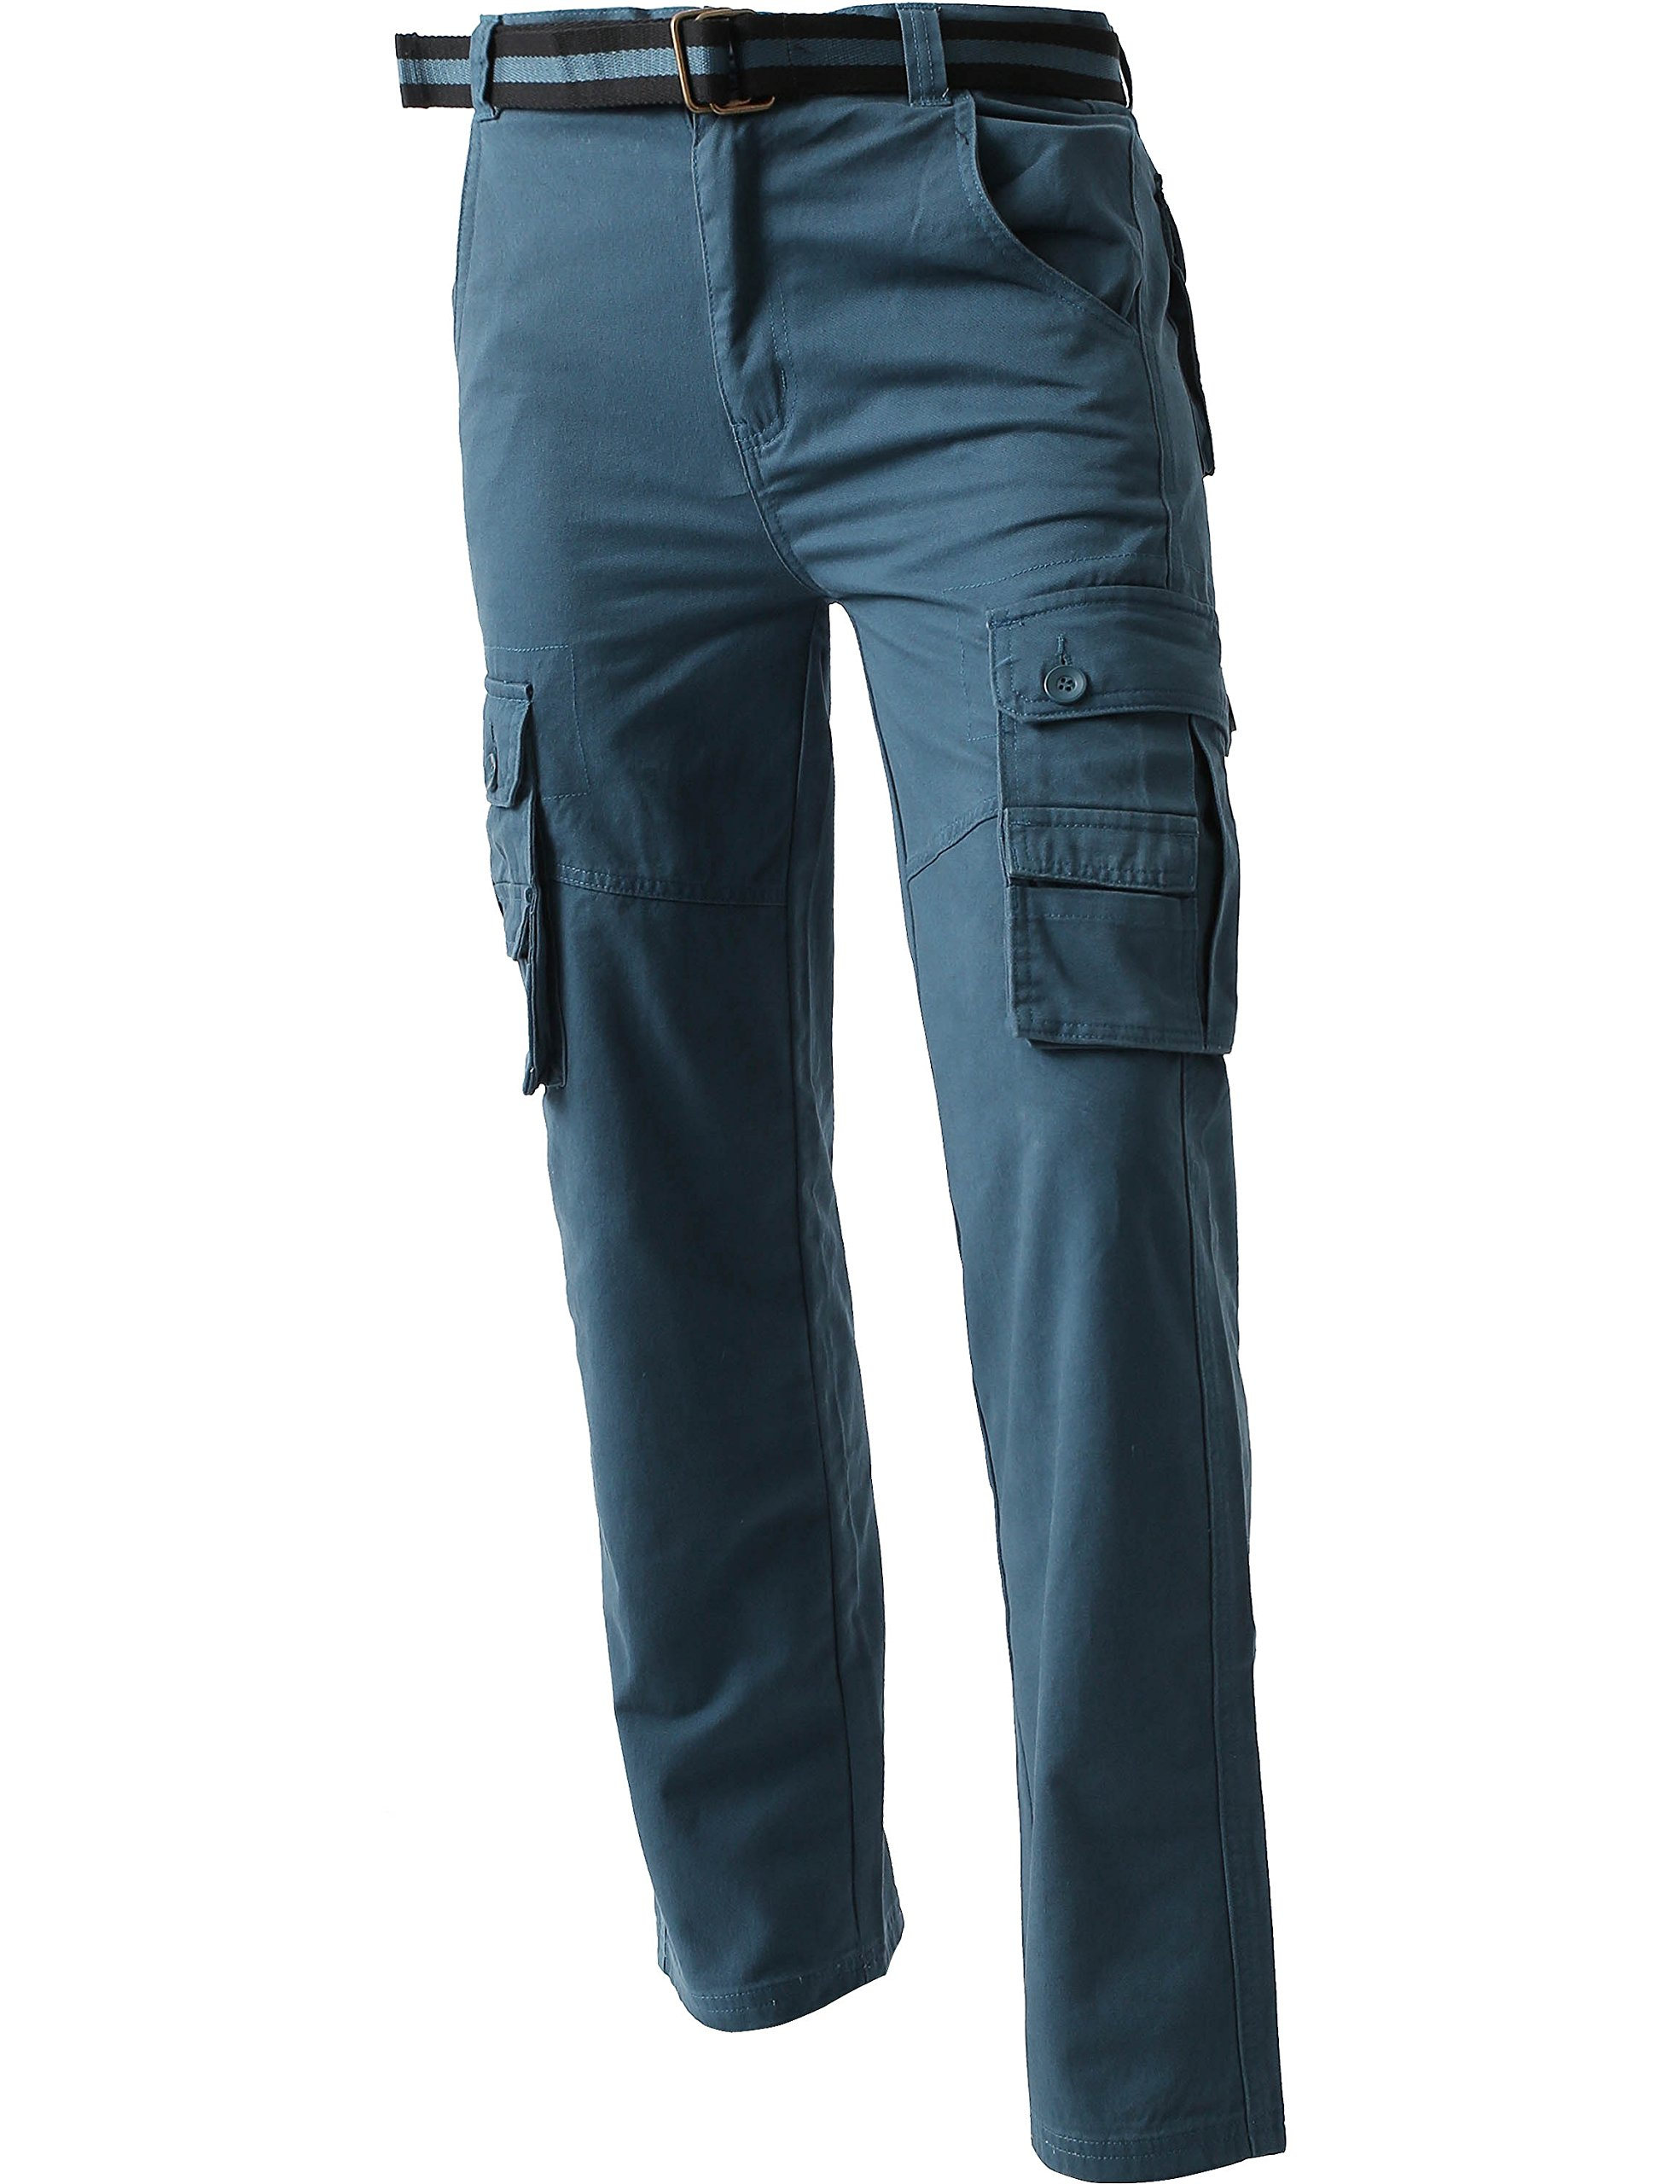 Ma Croix JP Mens Cargo Pants with Utility Belt (40/ pj01_dkblue) by Ma Croix (Image #3)